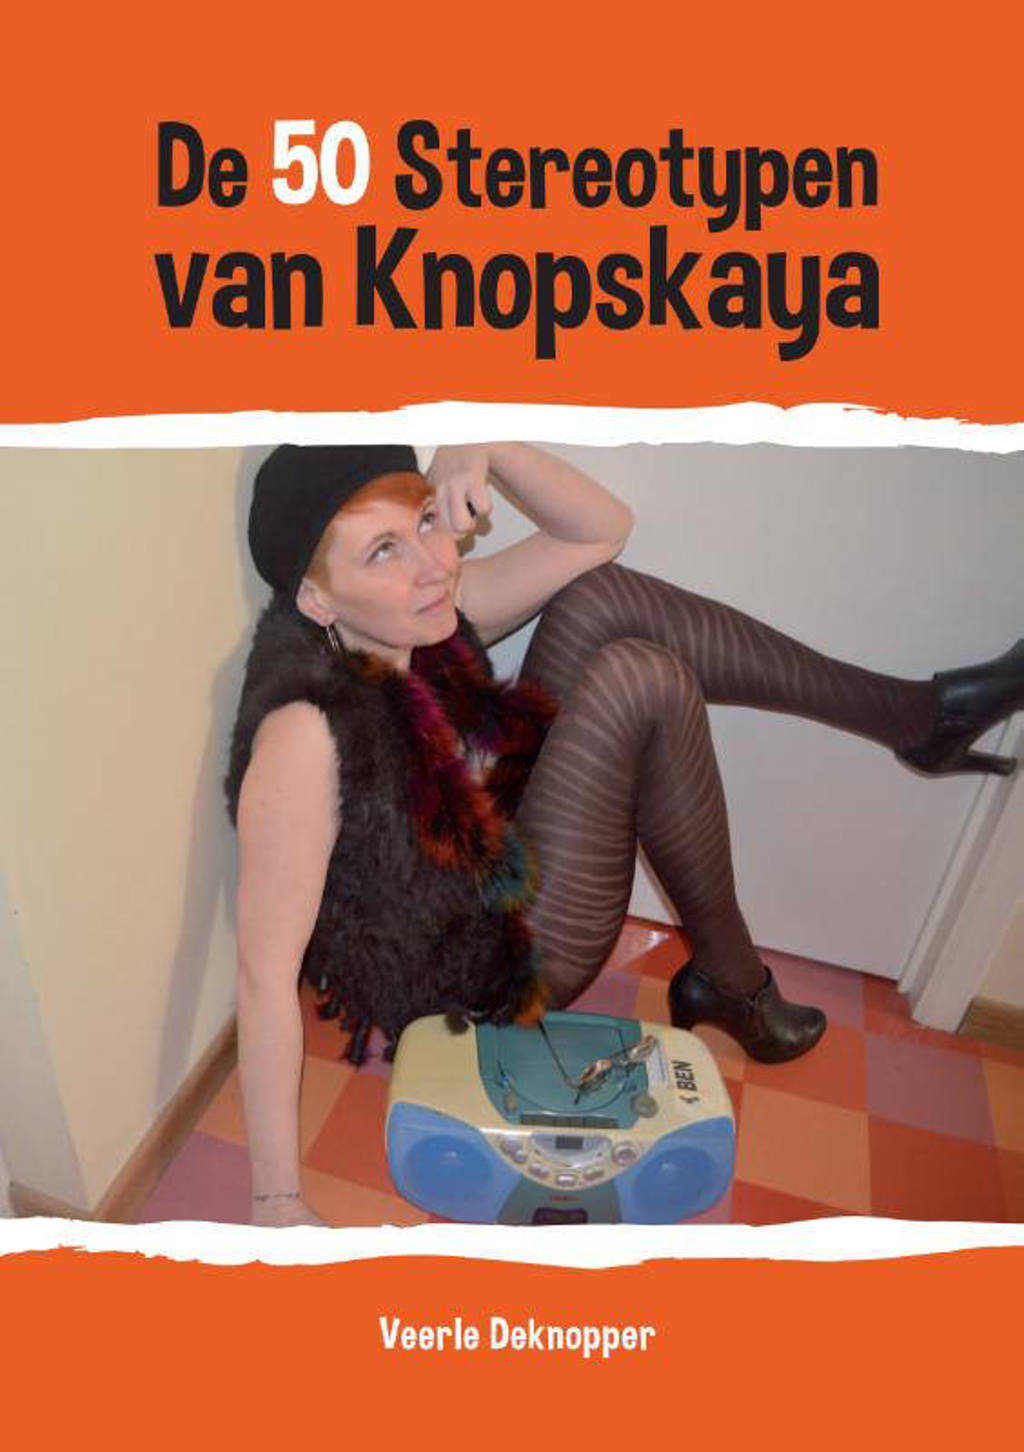 De 50 Stereotypen van Knopskaya - Veerle Deknopper